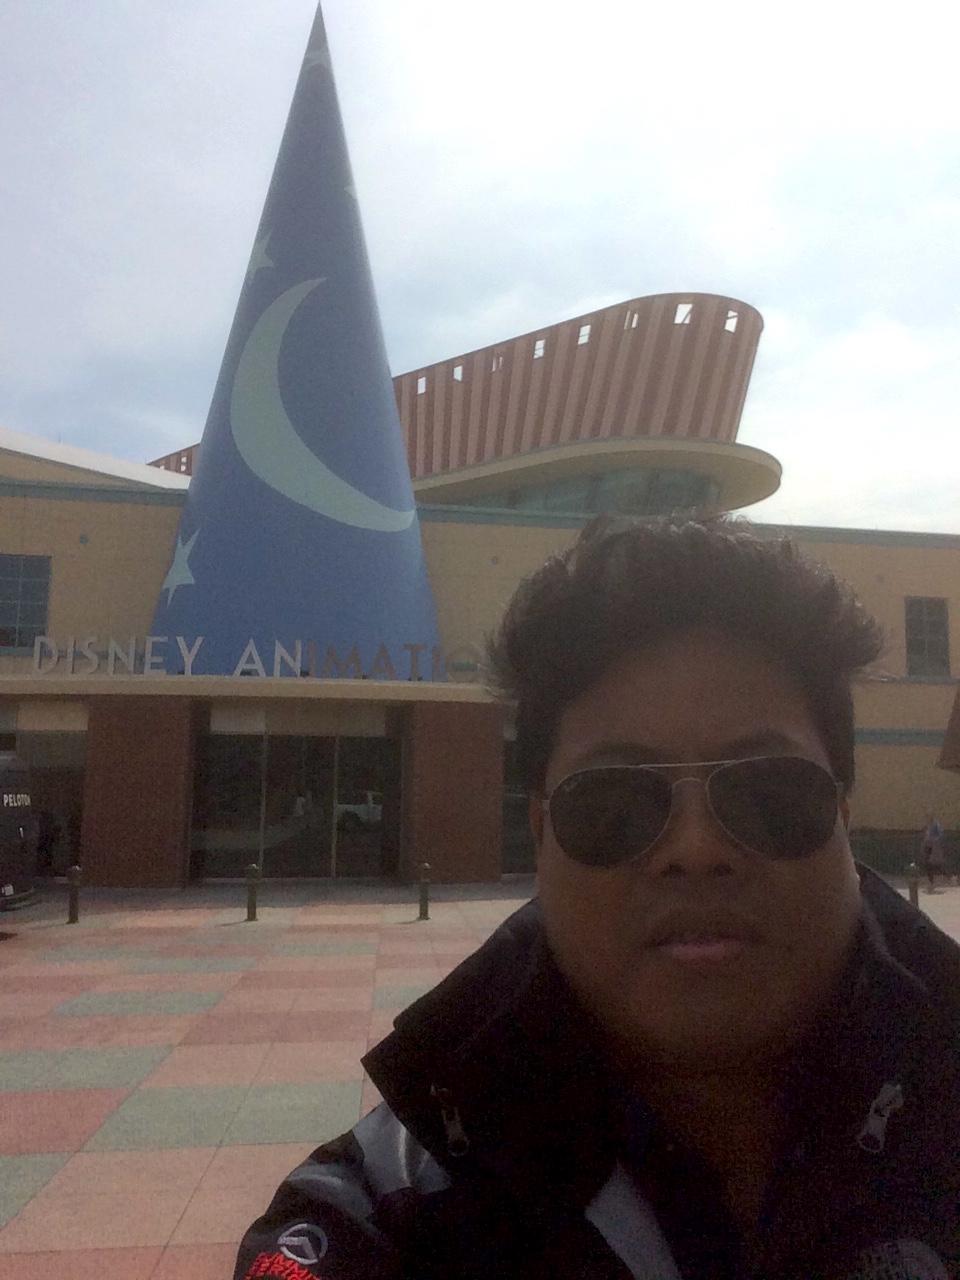 Walt Disney Animation Studios, BURBANK